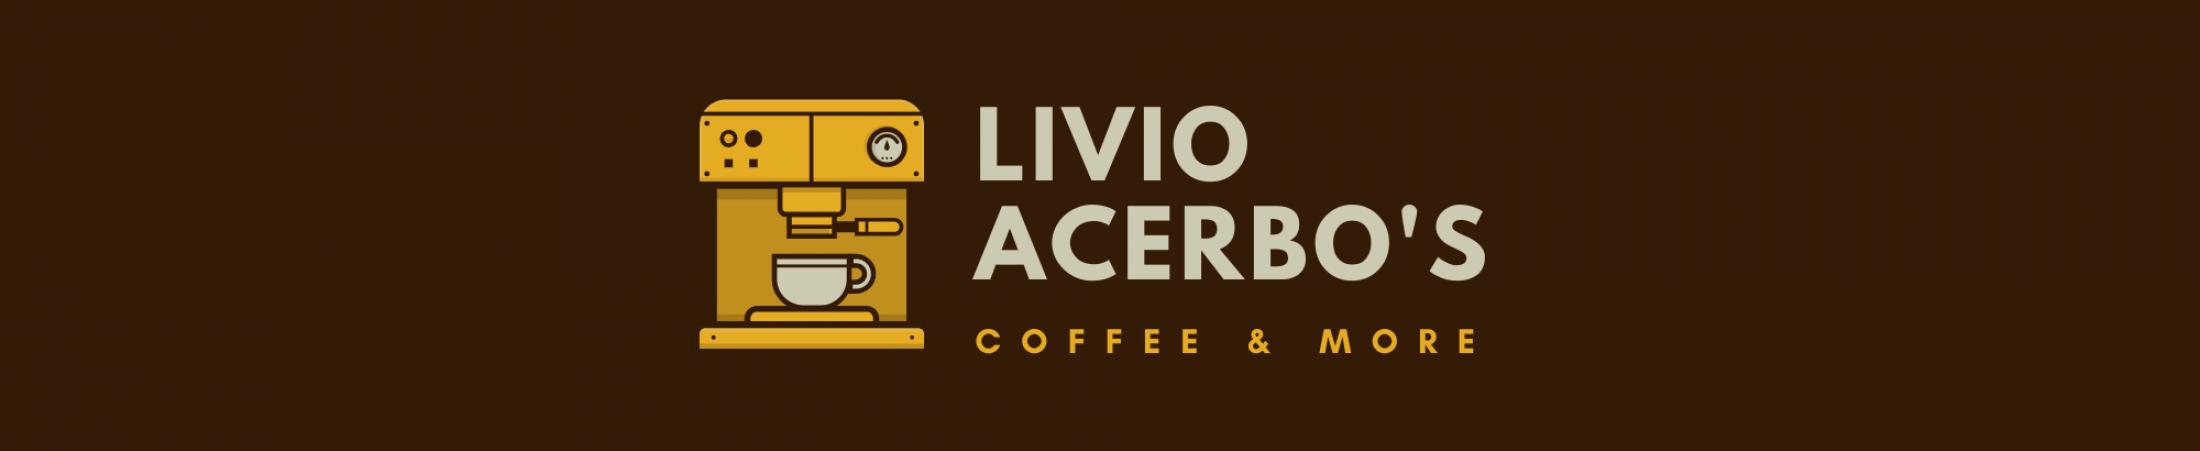 Livio Acerbo's Coffee & More